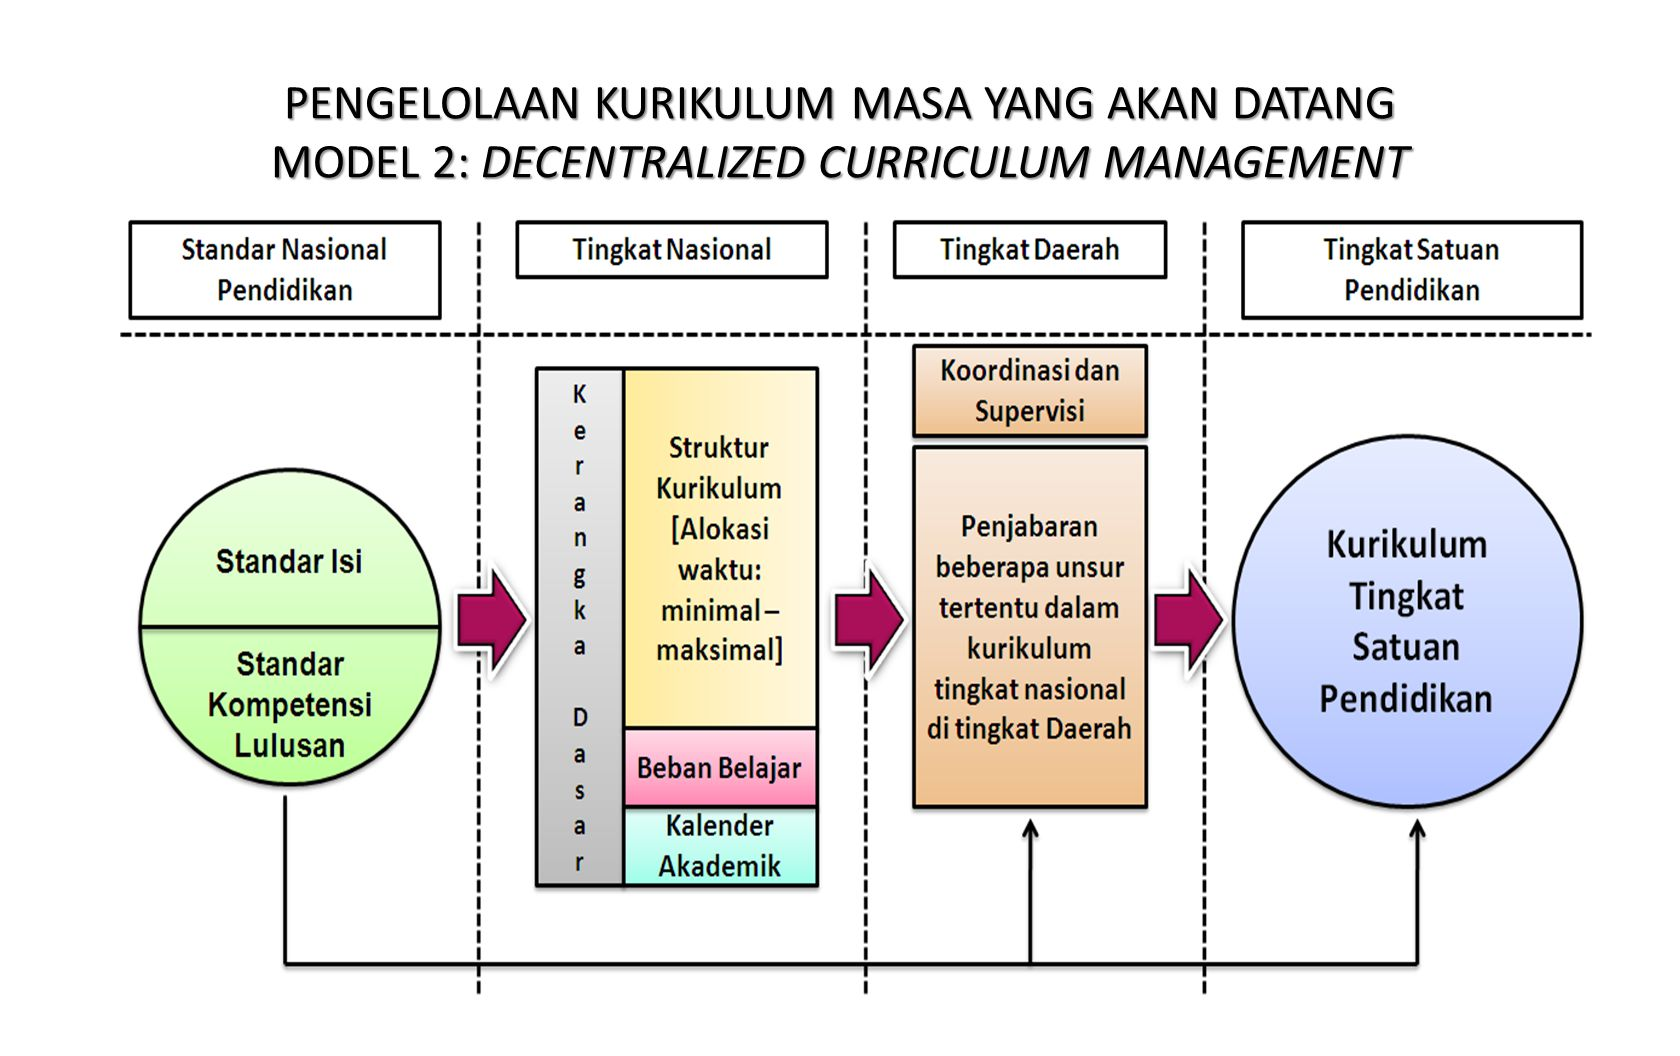 PENGELOLAAN KURIKULUM MASA YANG AKAN DATANG MODEL 2: DECENTRALIZED CURRICULUM MANAGEMENT